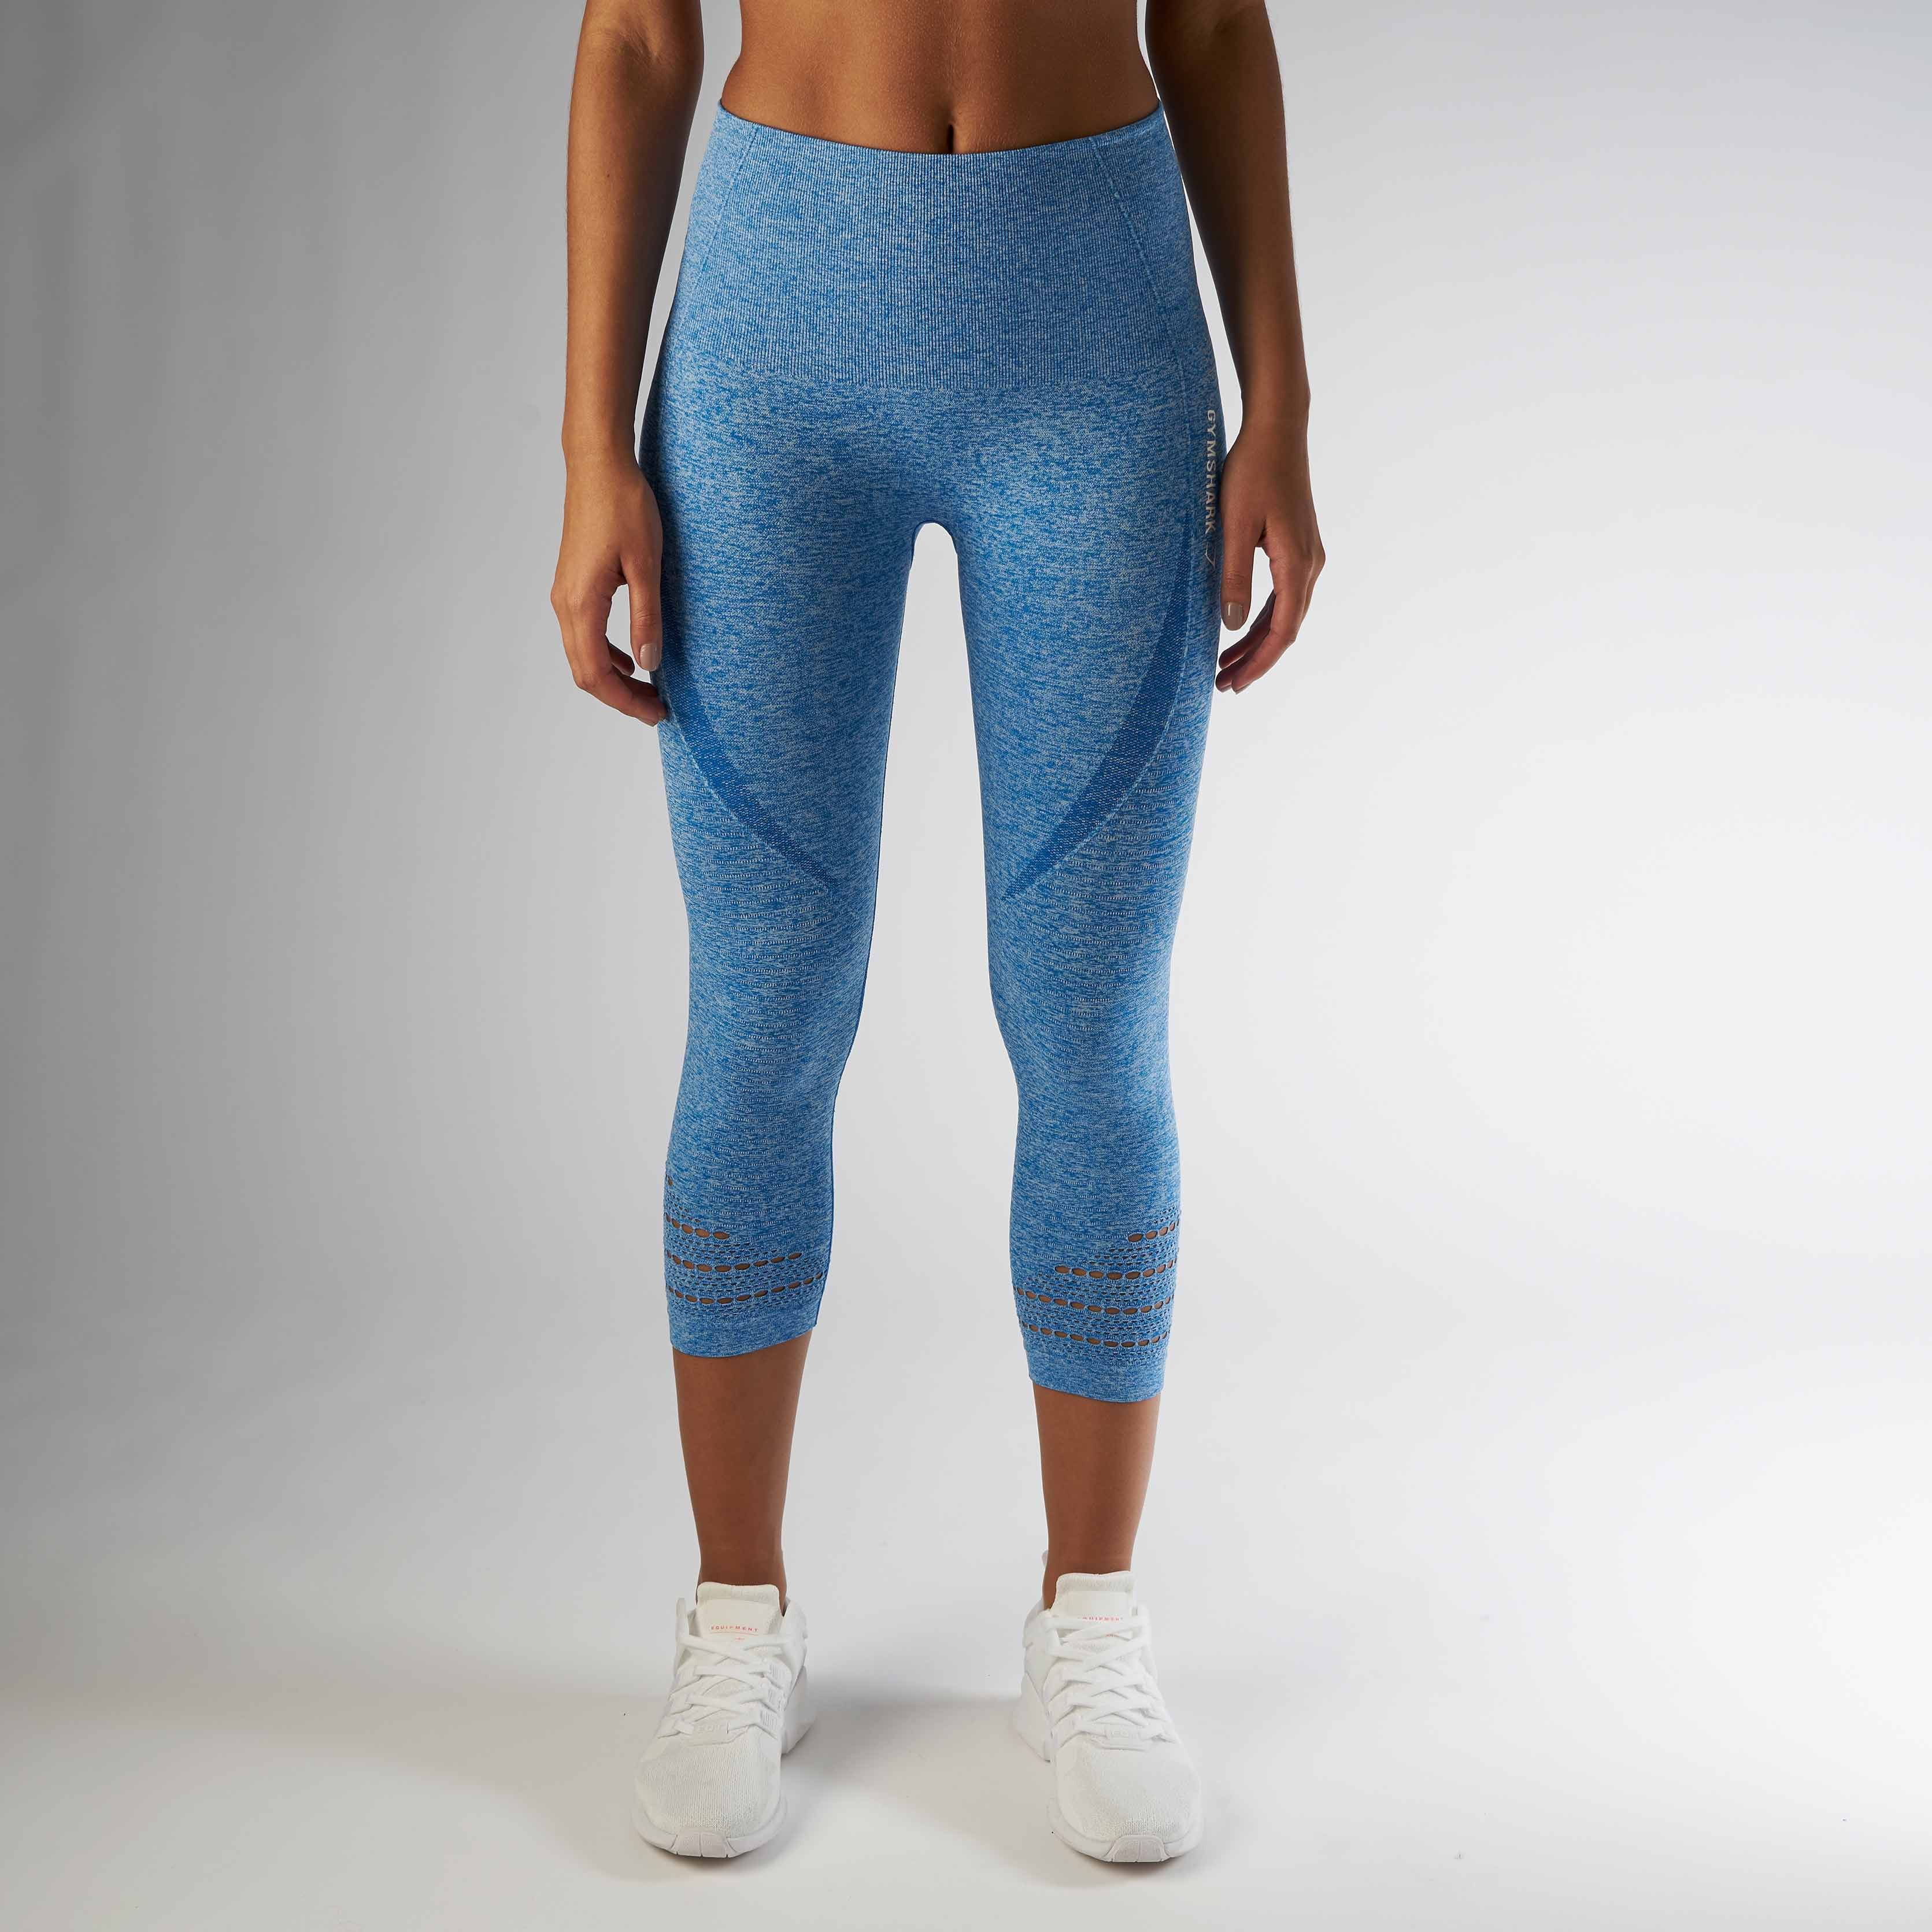 43fa8e6f4ef70 Gymshark High Waisted Seamless Cropped Legging - Blueberry Marl ...